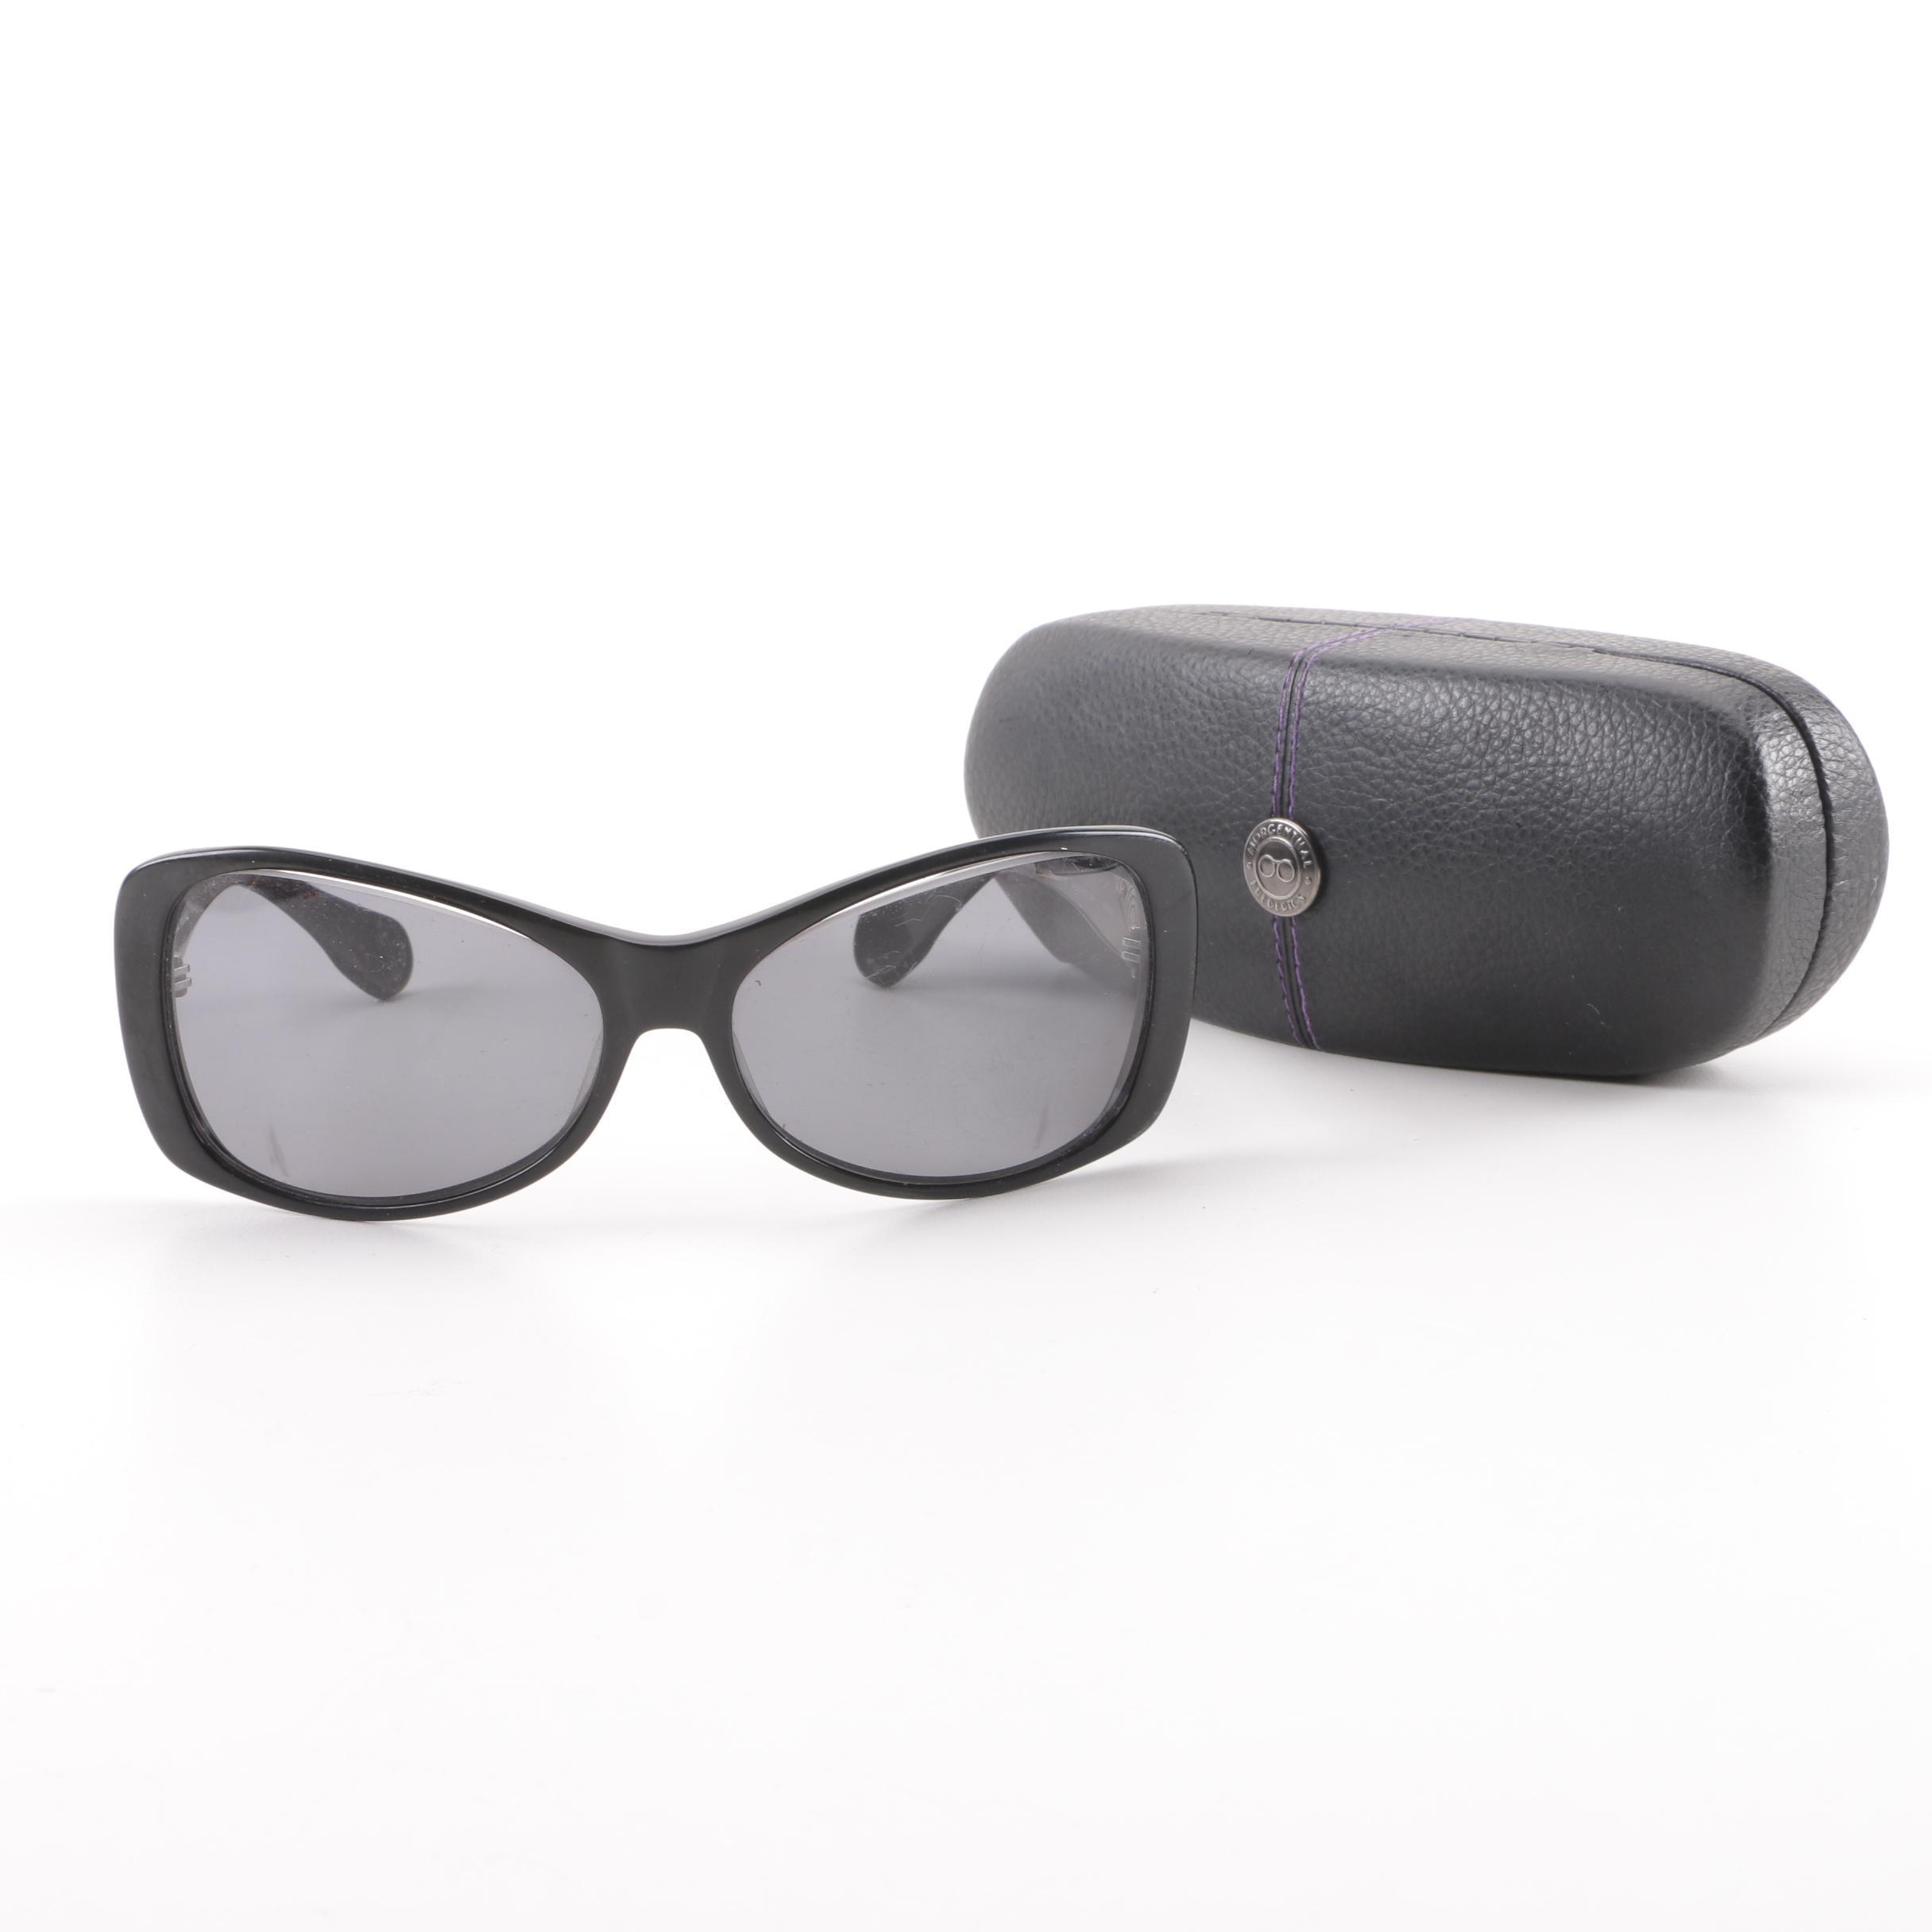 Morgenthal Frederics Madison Black Framed Sunglasses, Handmade in Japan